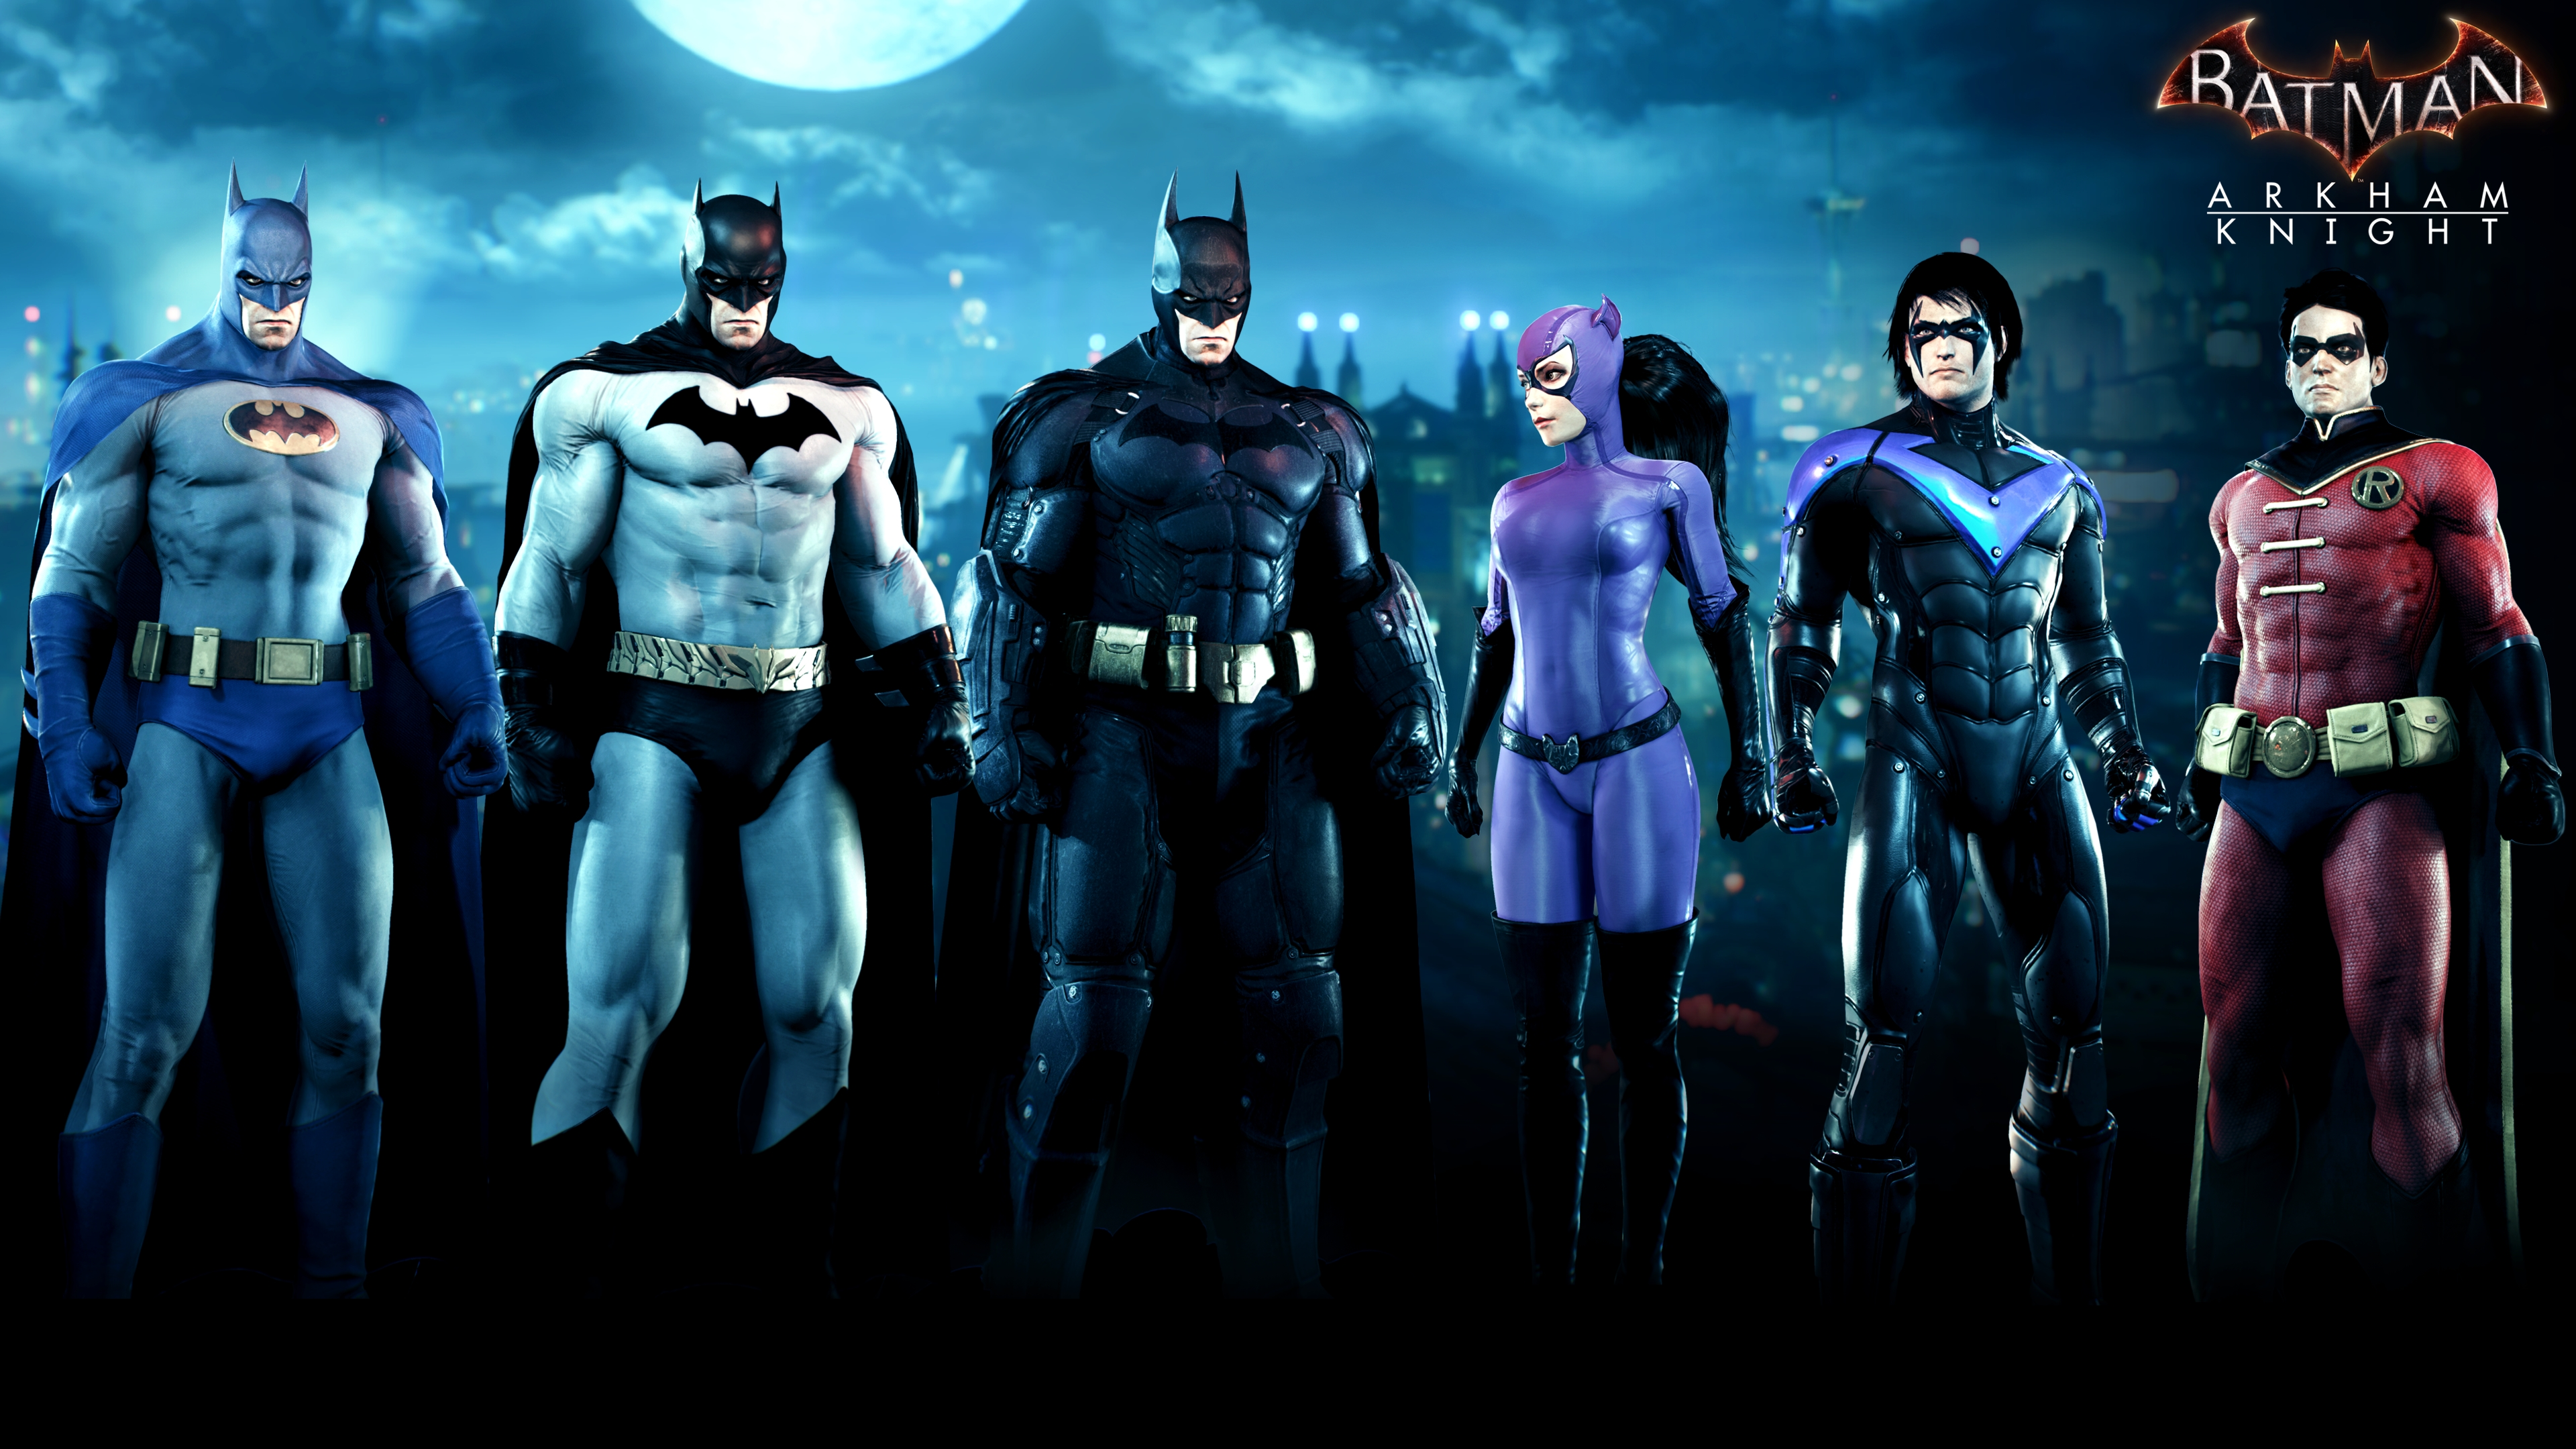 Amazing Batman: Arkham Knight Pictures & Backgrounds